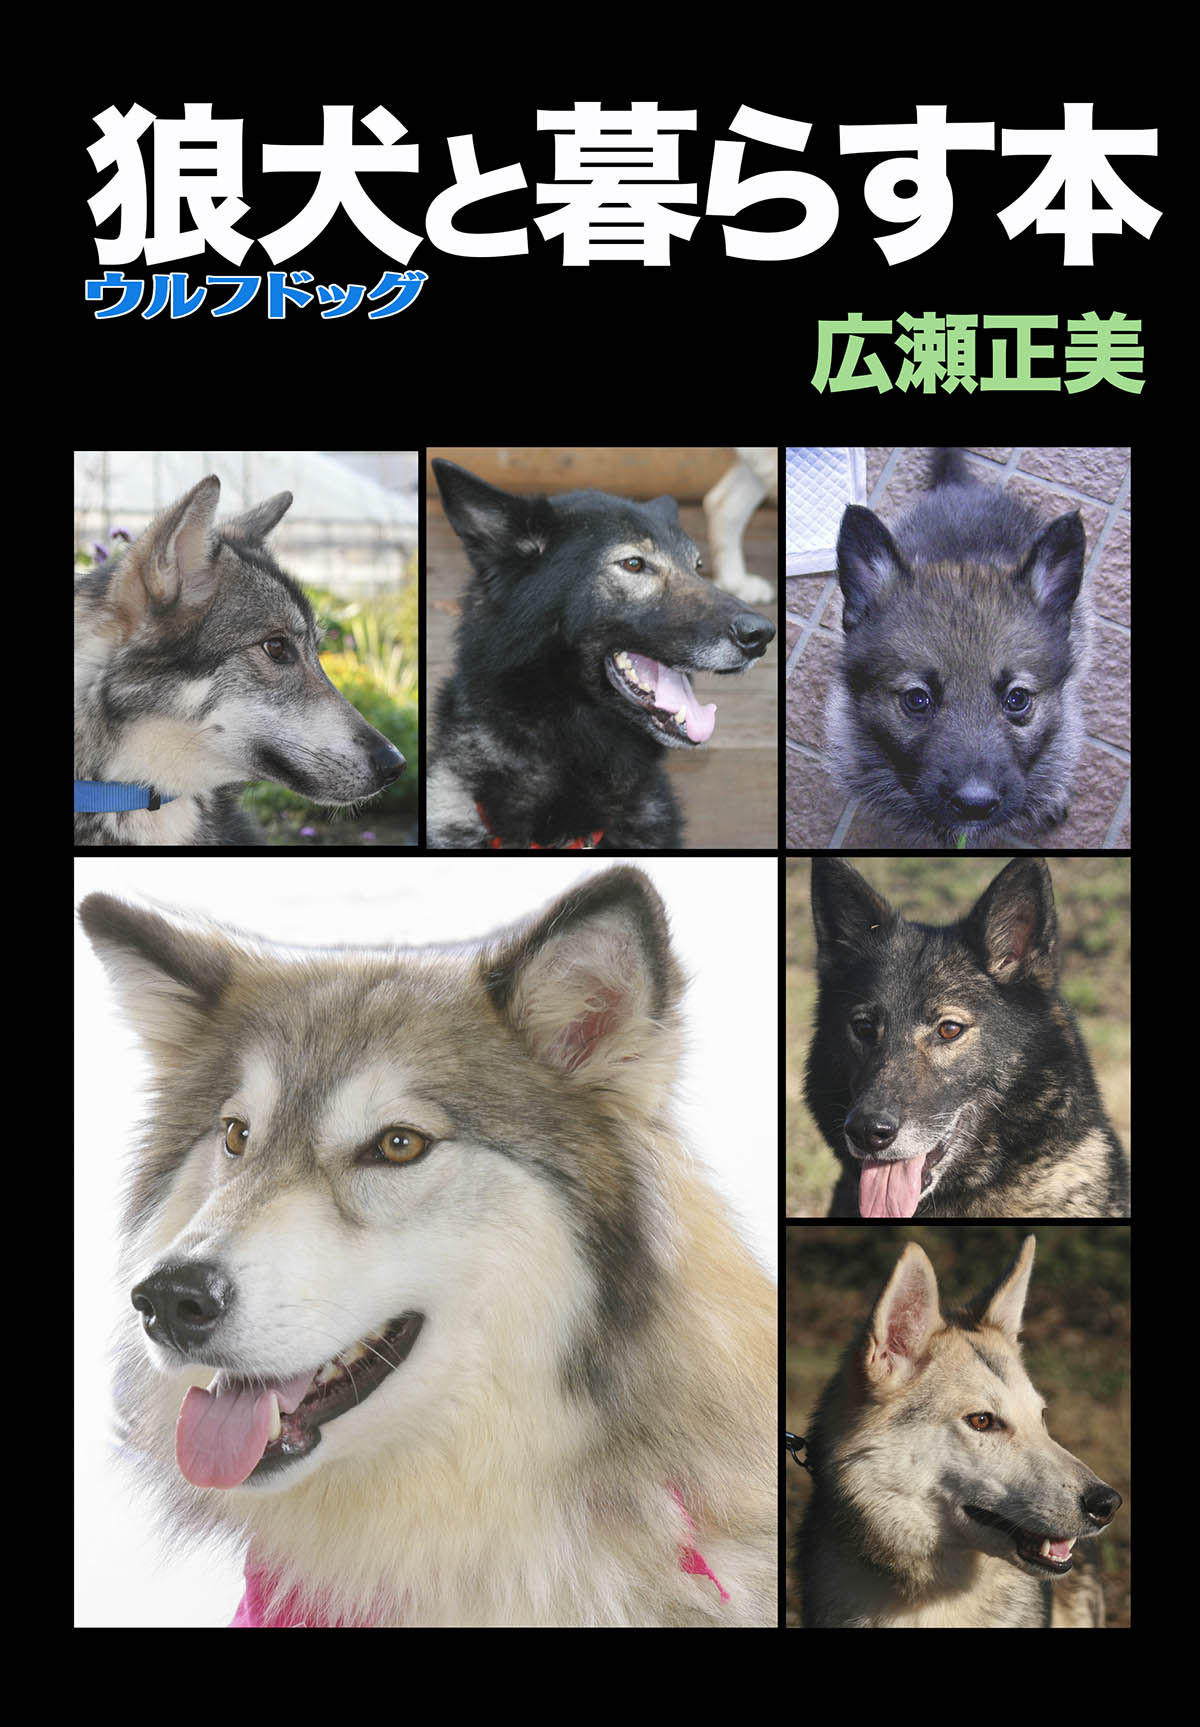 2016_SERIORS STORY 日本狼犬クラブ_02